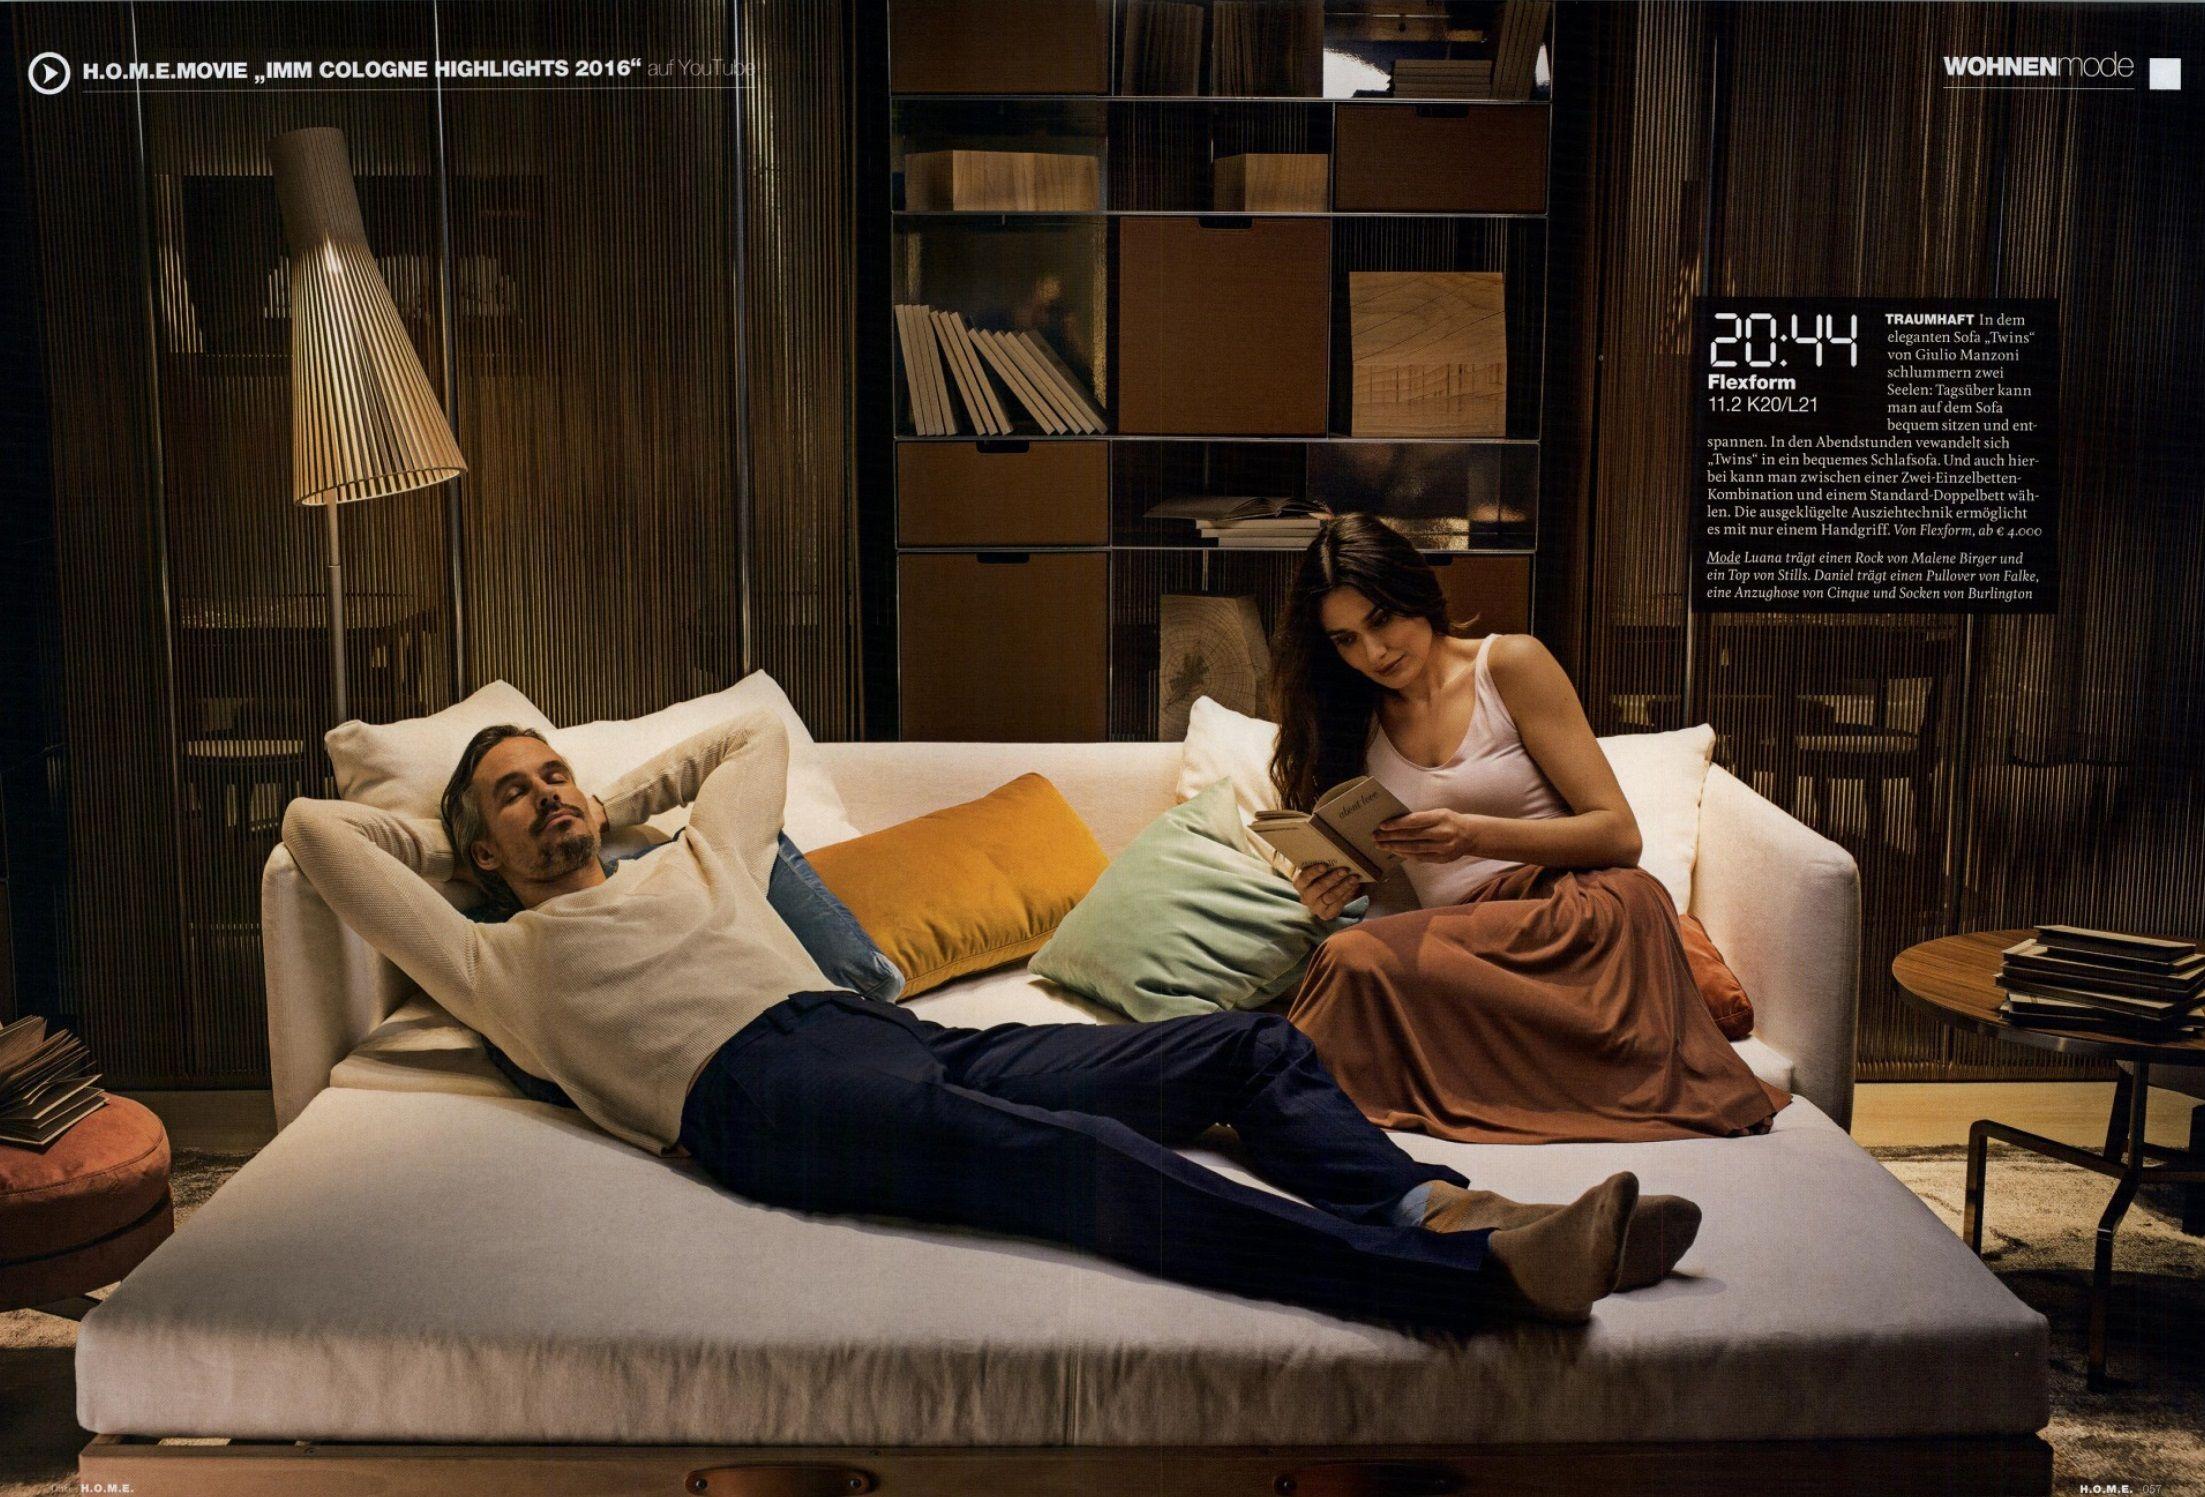 #FLEXFORM new TWINS #sofabed #design Giulio Manzoni on H.O.M.E. magazine, Germany march issue.